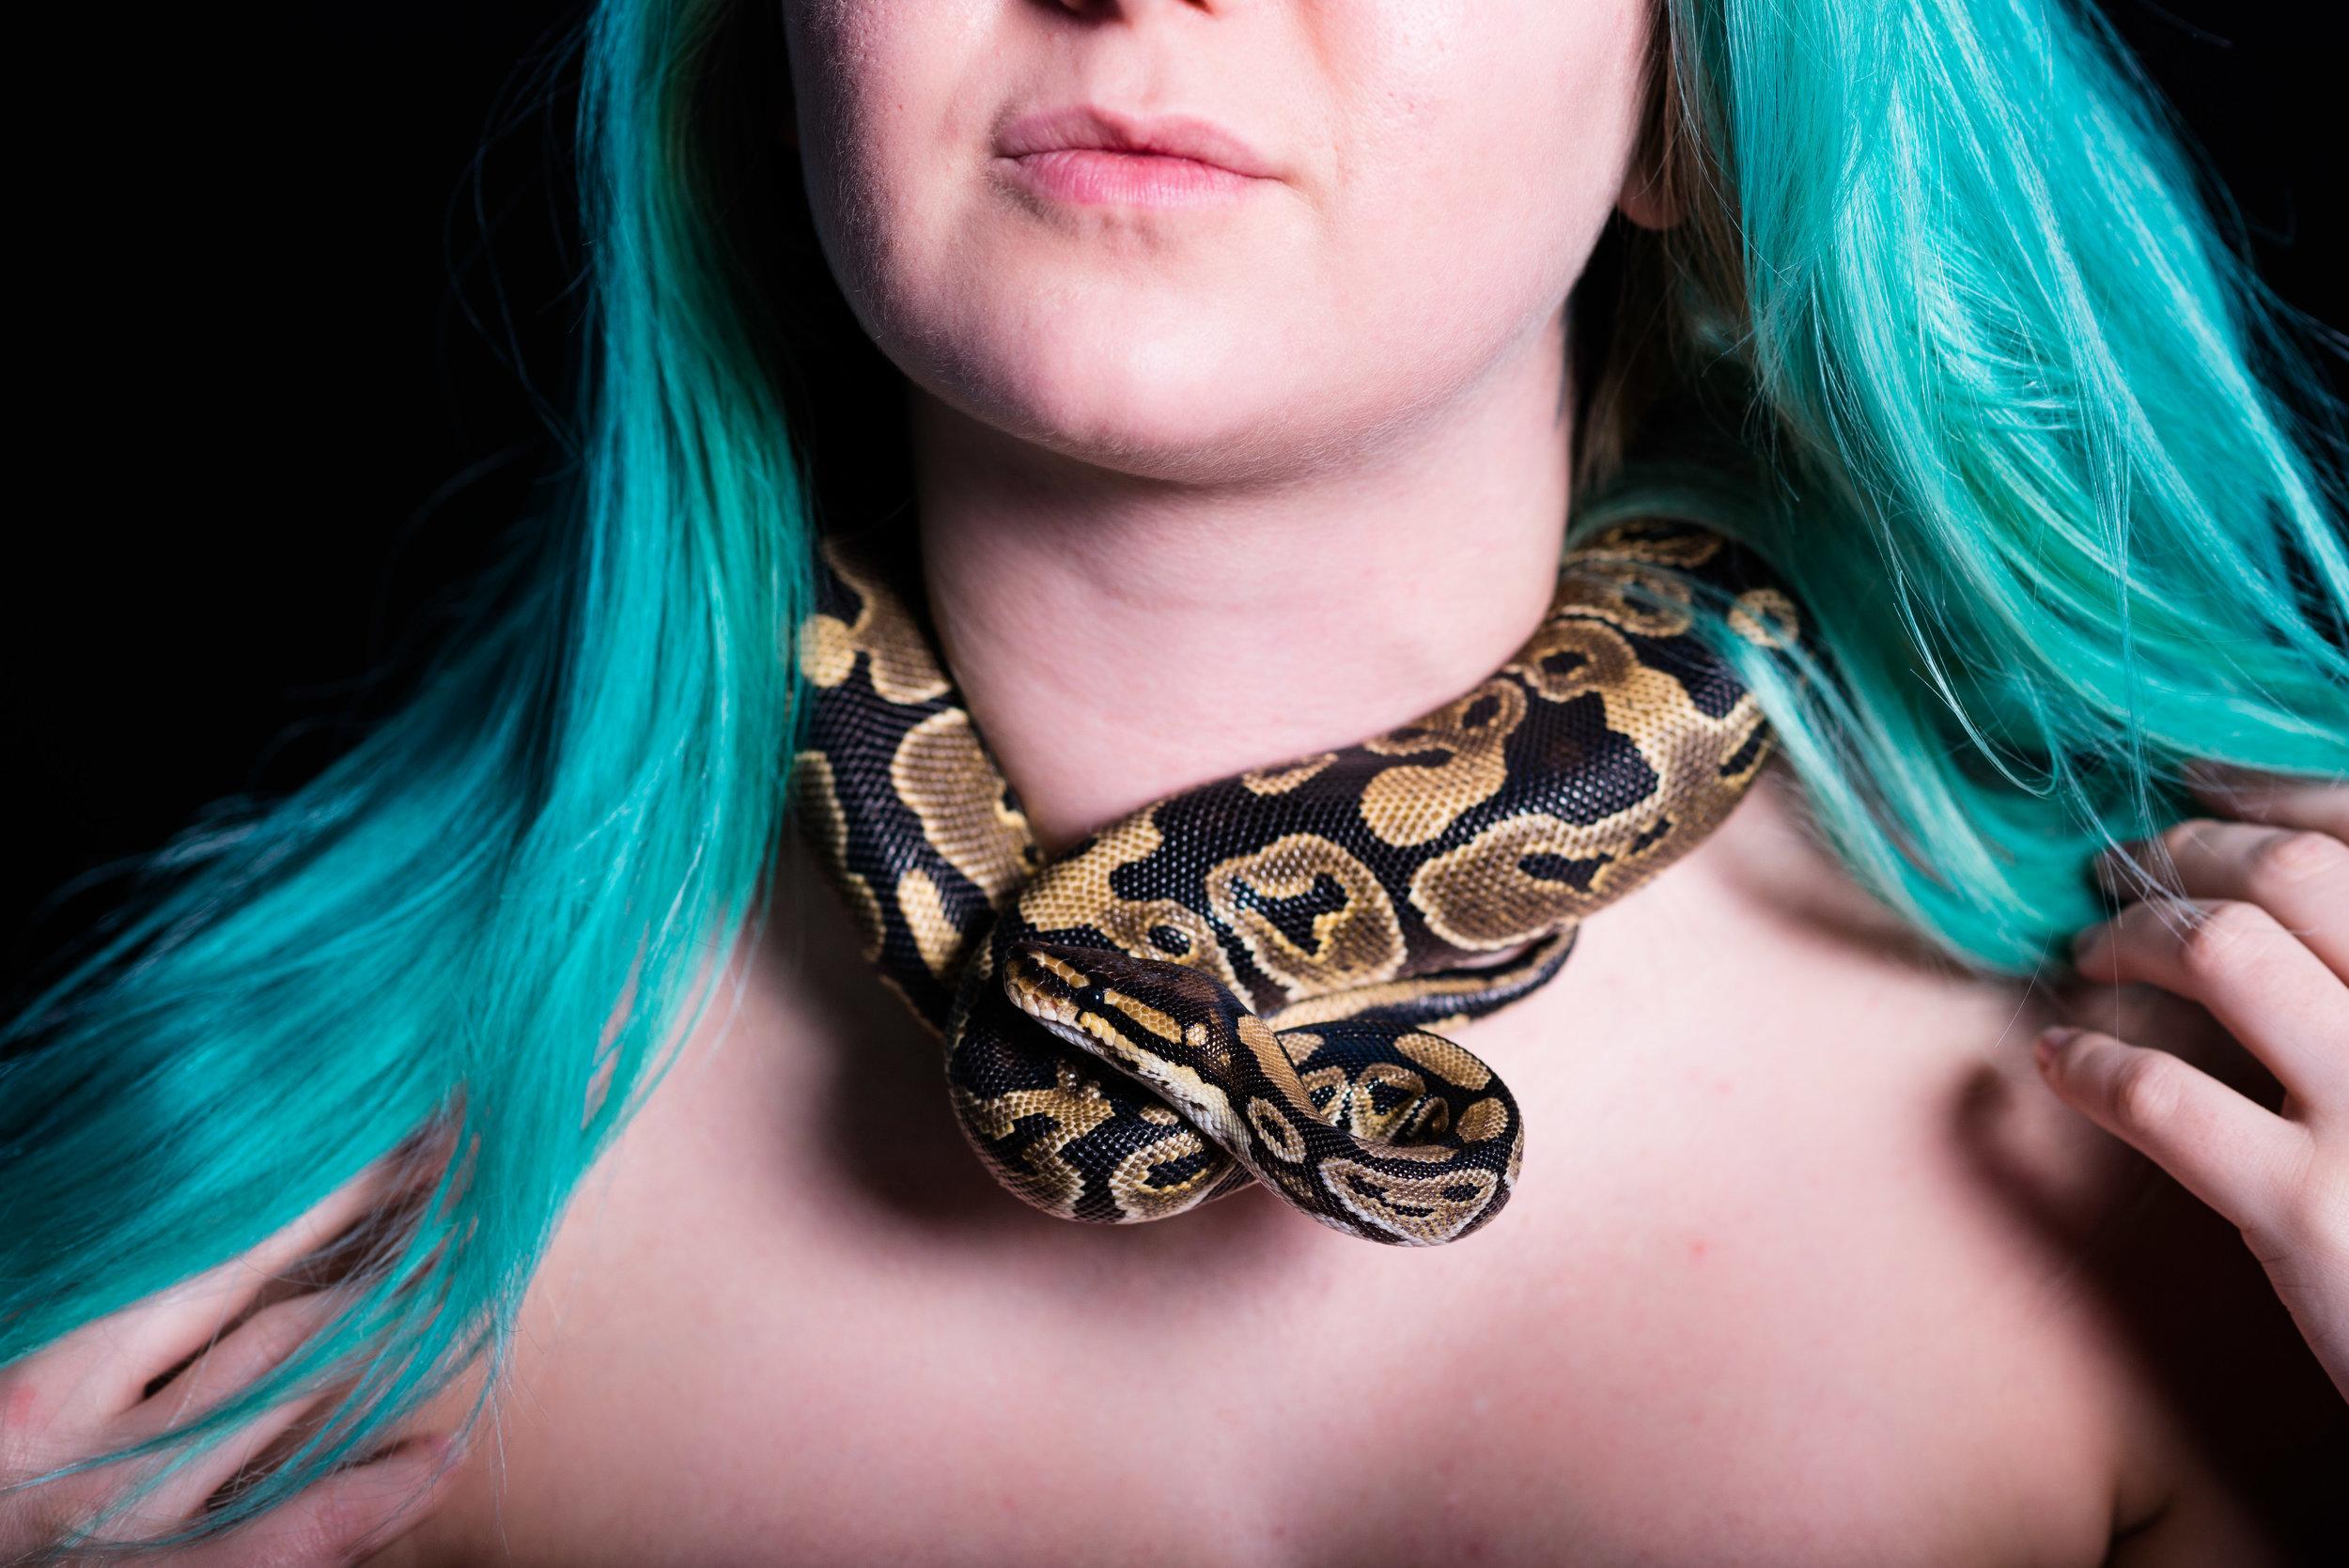 snake themed image